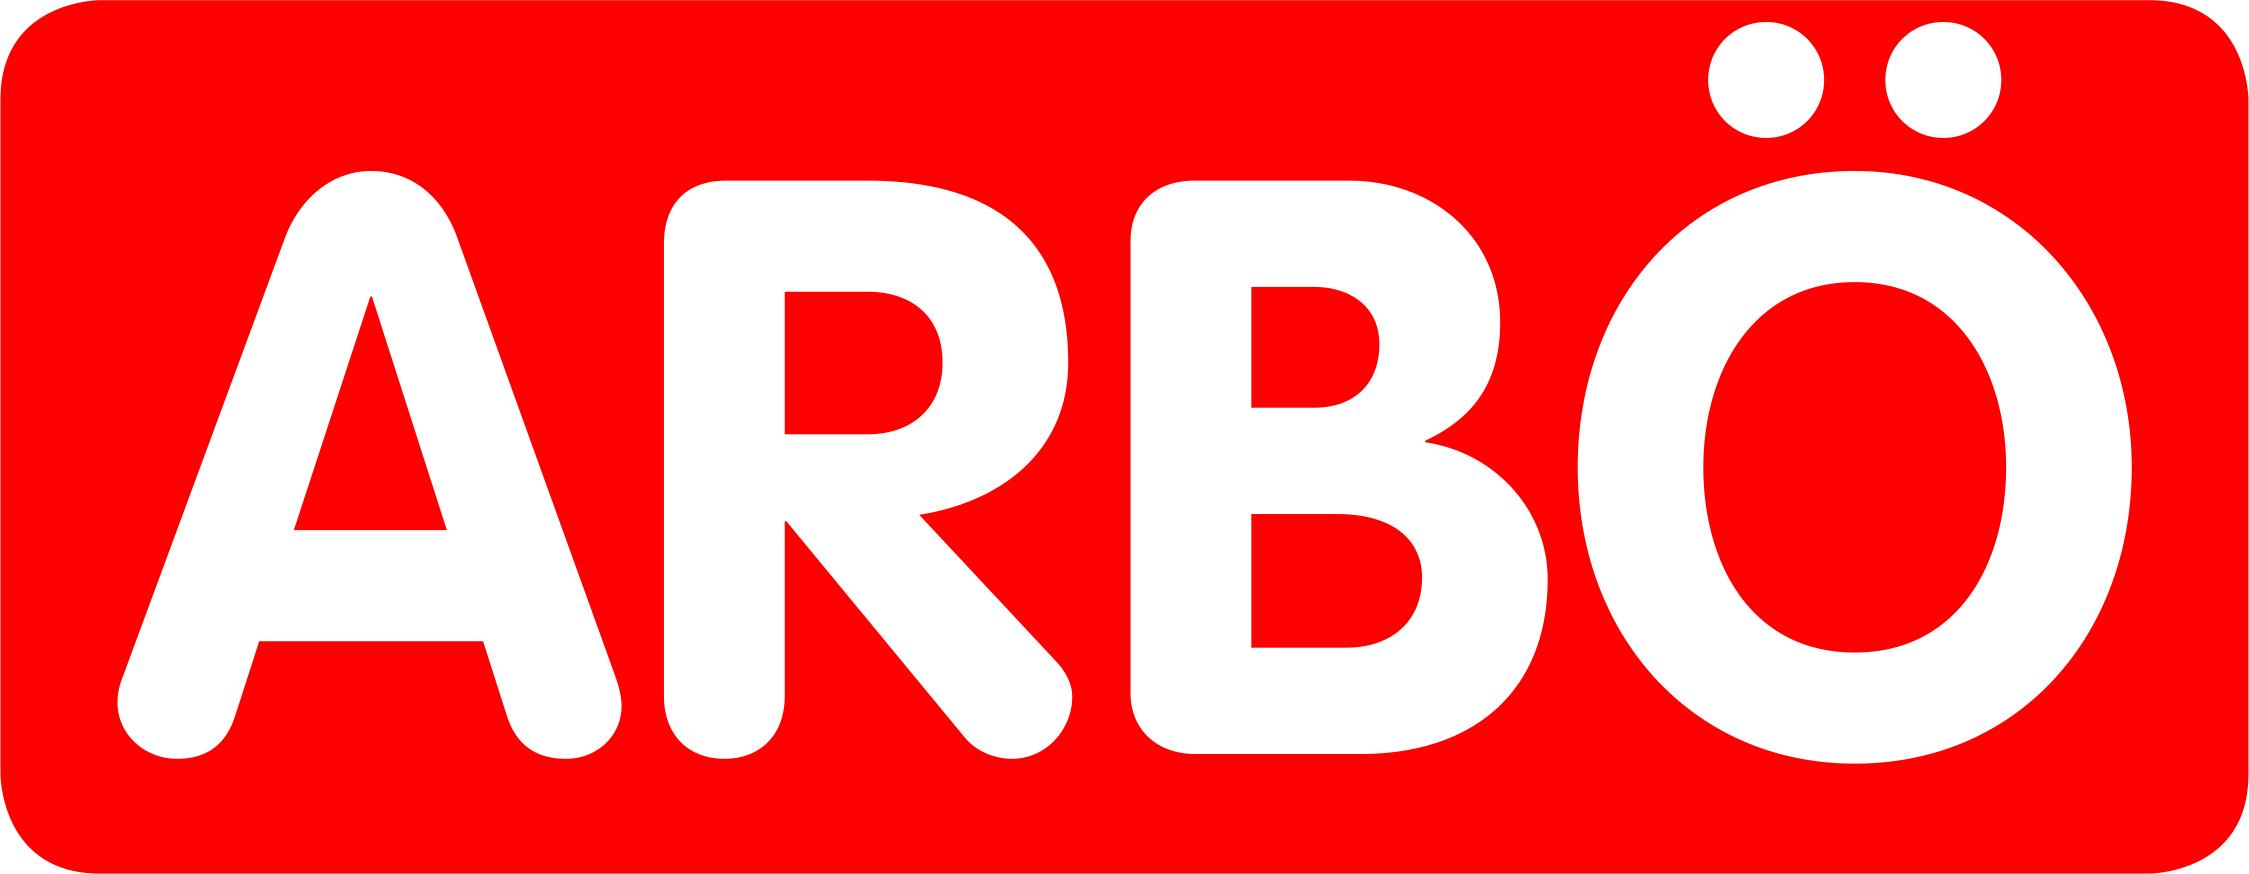 Logo vom Arboe